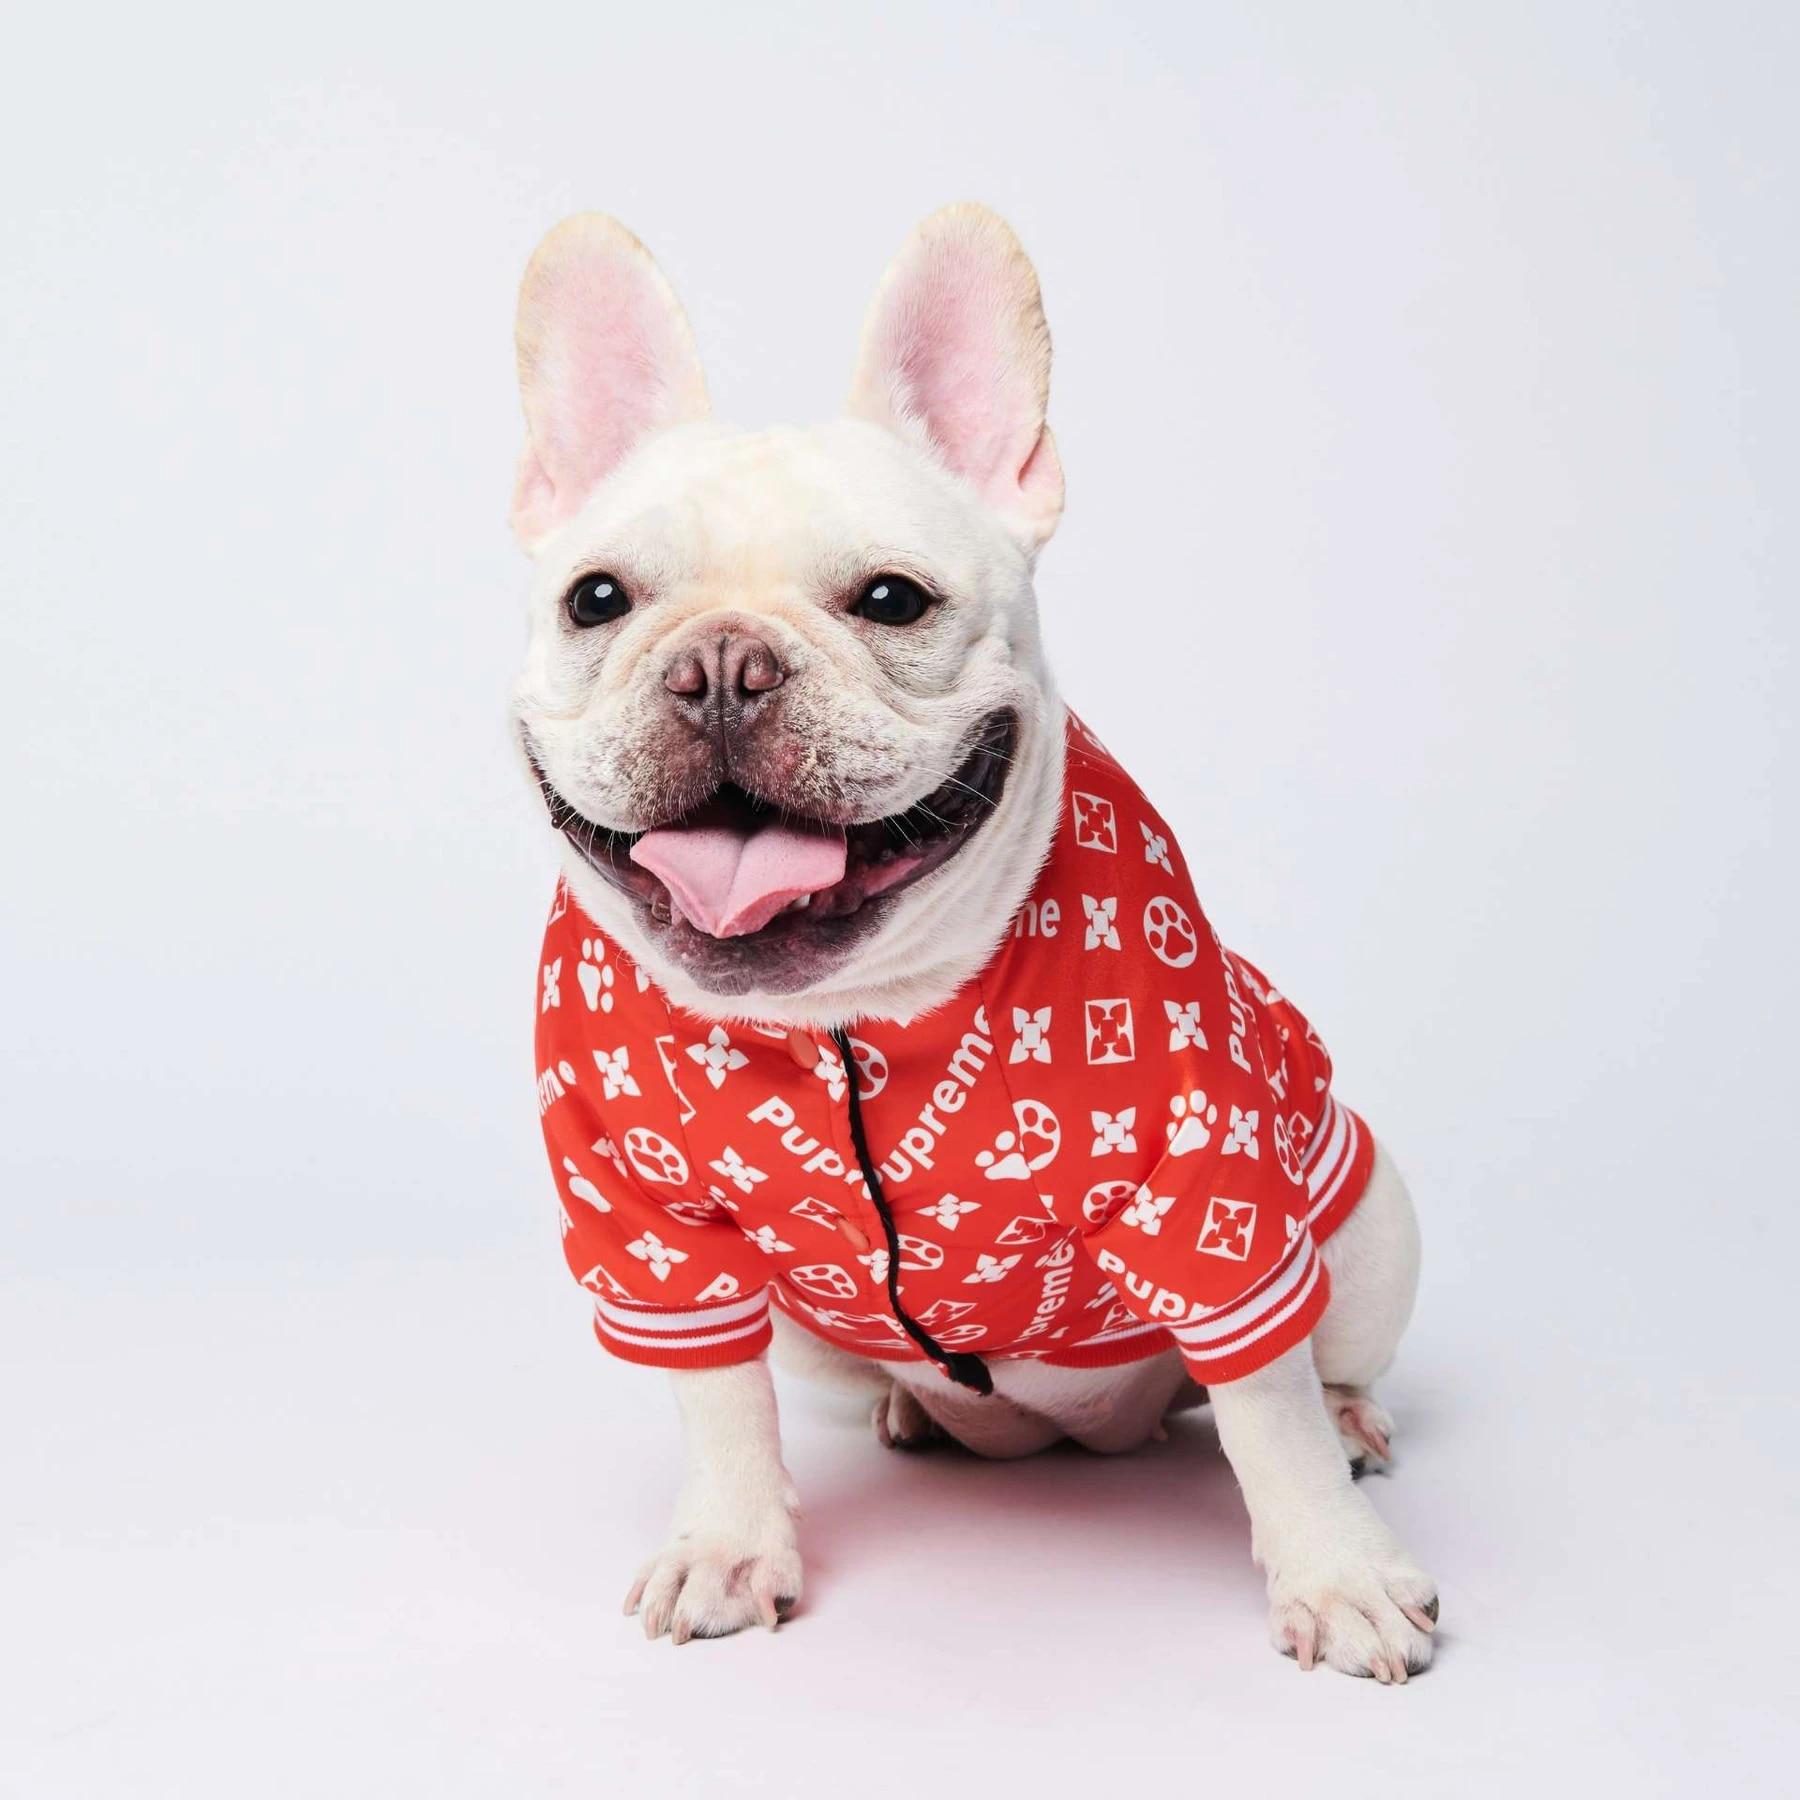 French Bulldog Clothes Dog Hoodie Luxurious Adidog Warm Sport Retro Dog Hoodies Pet Clothes Puppy Dog Pugs Puppy Clothes Luxury Dog Hoodies Aliexpress